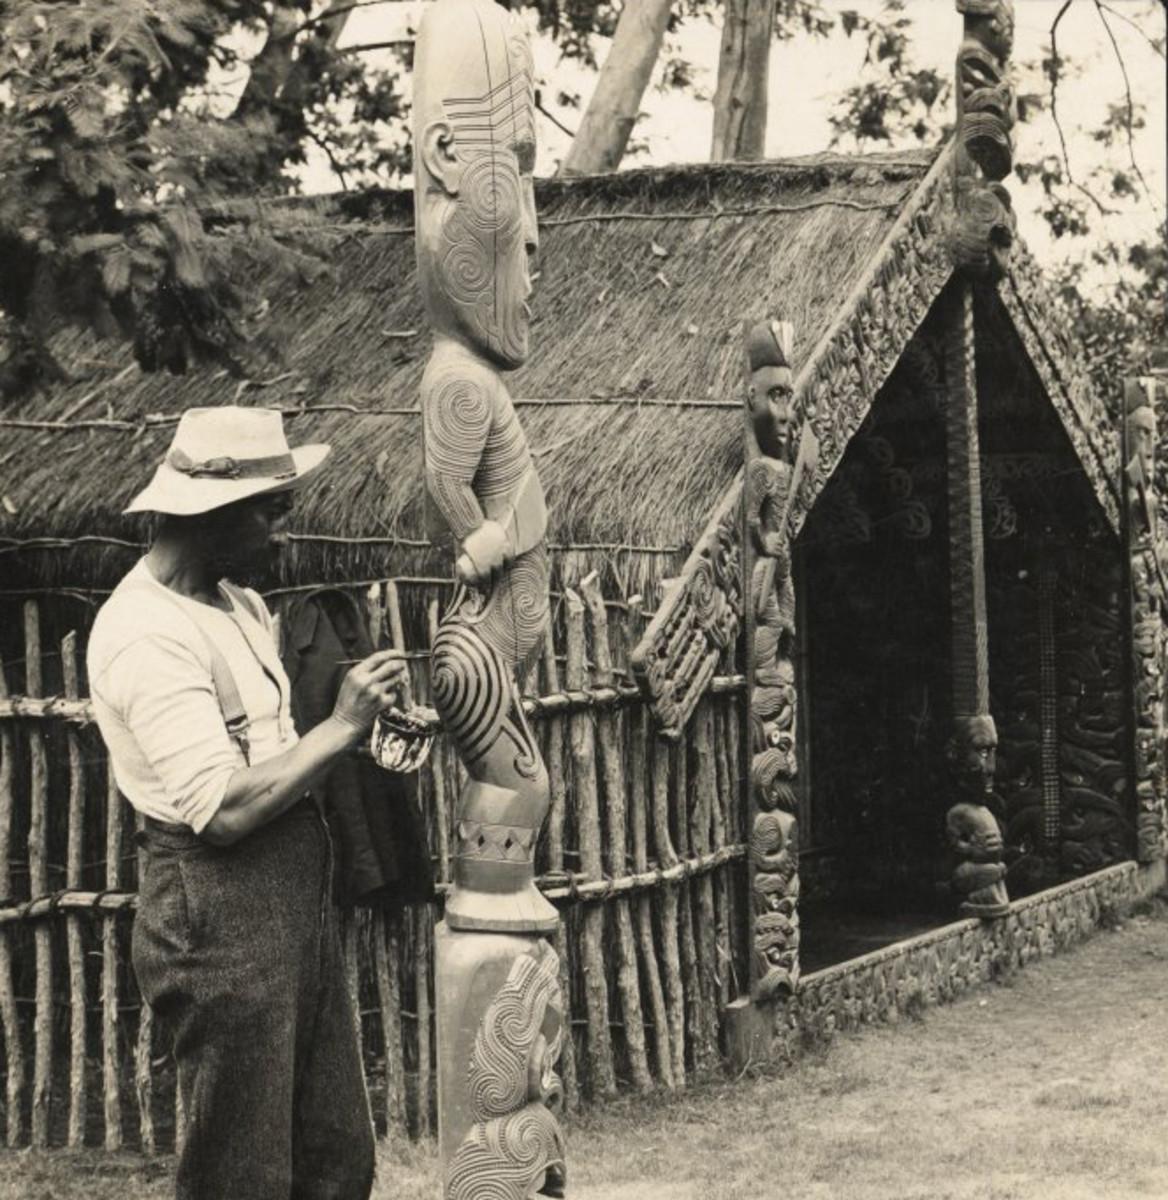 A Maori man retouches the tattoo on a tiki sculpture.